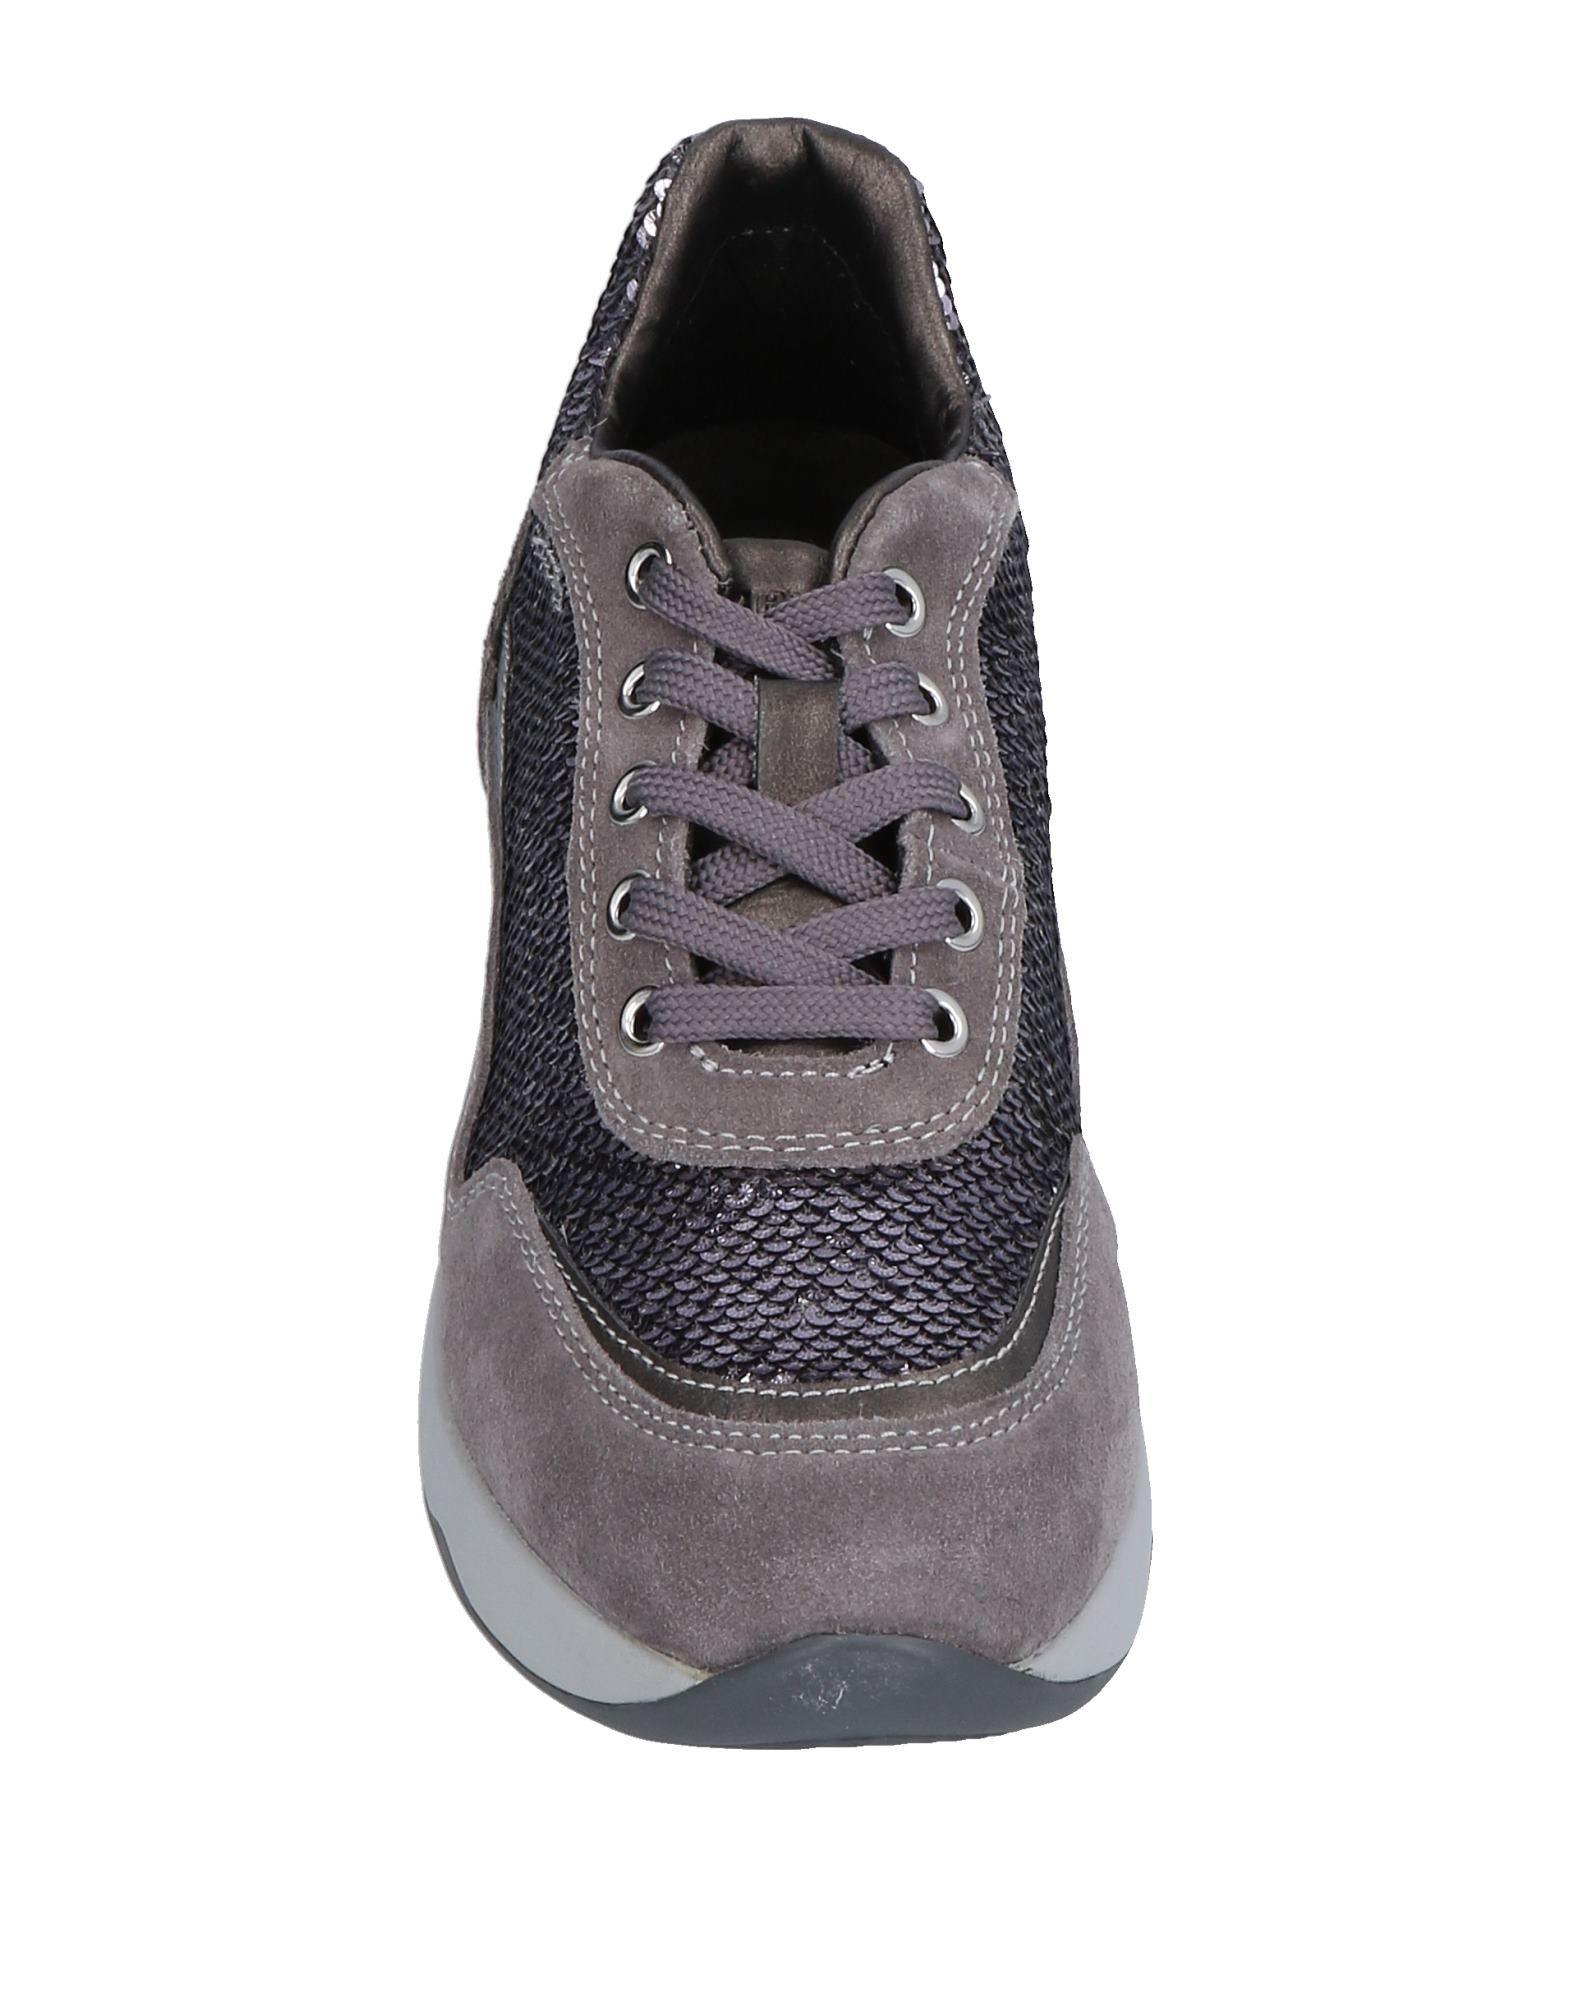 7a255bc5945 LUMBERJACK ΠΑΠΟΥΤΣΙΑ Παπούτσια τένις χαμηλά, Γυναικεία παπούτσια τέννις,  ΓΥΝΑΙΚΑ | ΠΑΠΟΥΤΣΙΑ | ΤΕΝΝΙΣ